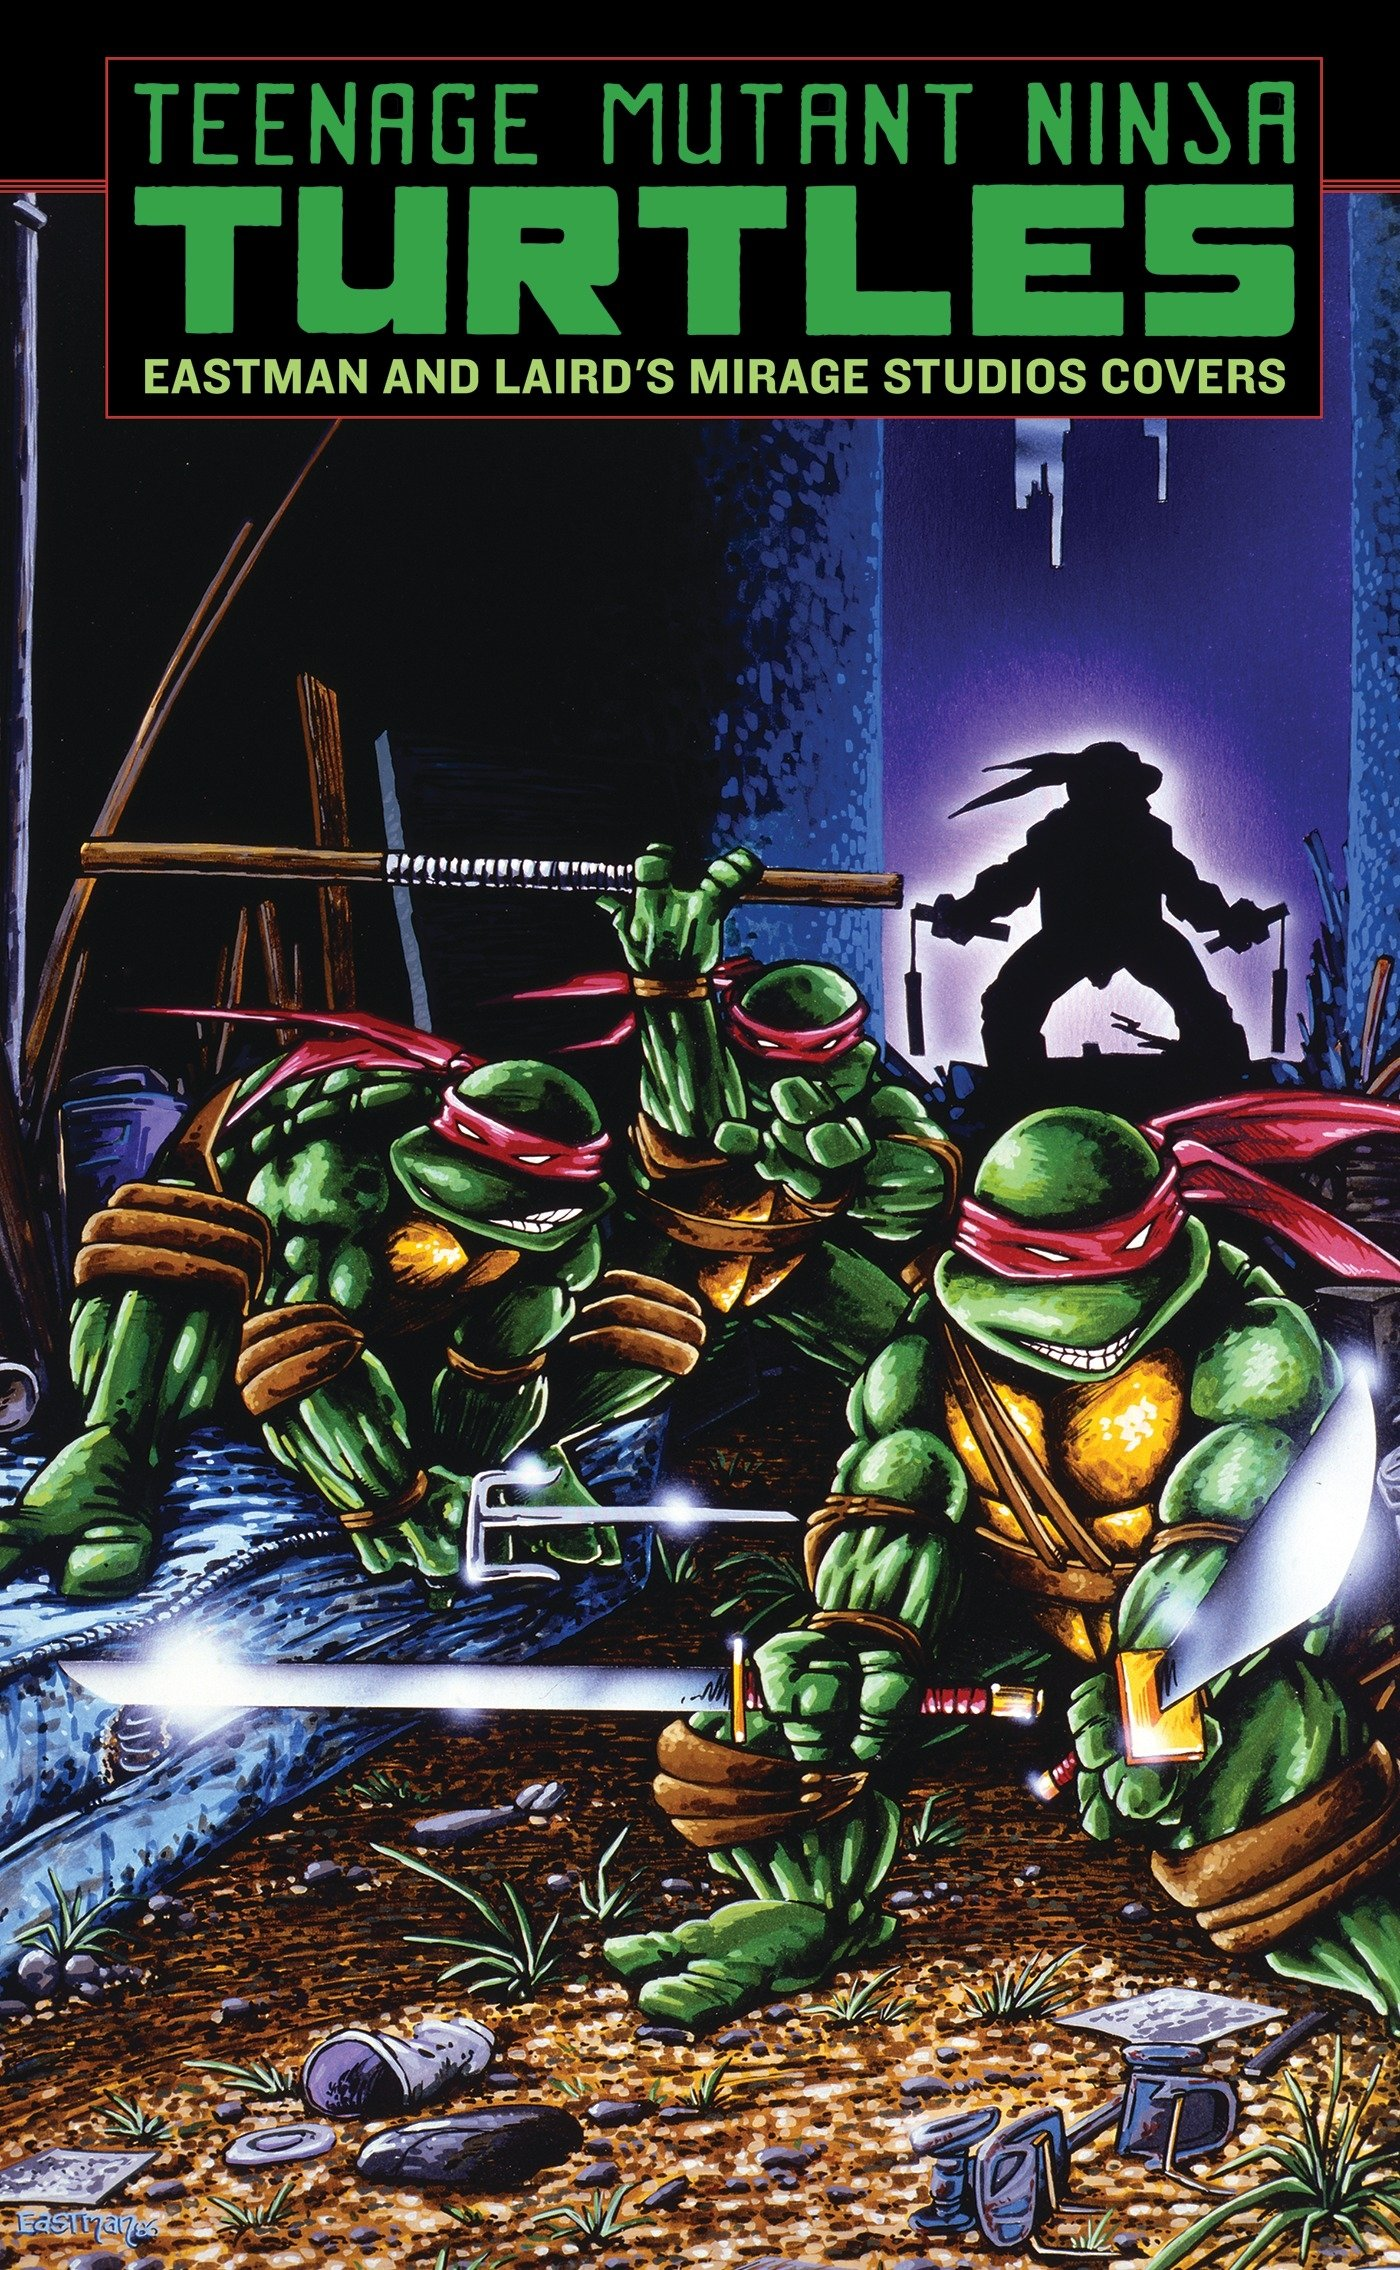 Teenage Mutant Ninja Turtles: Eastman and Lairds Mirage ...